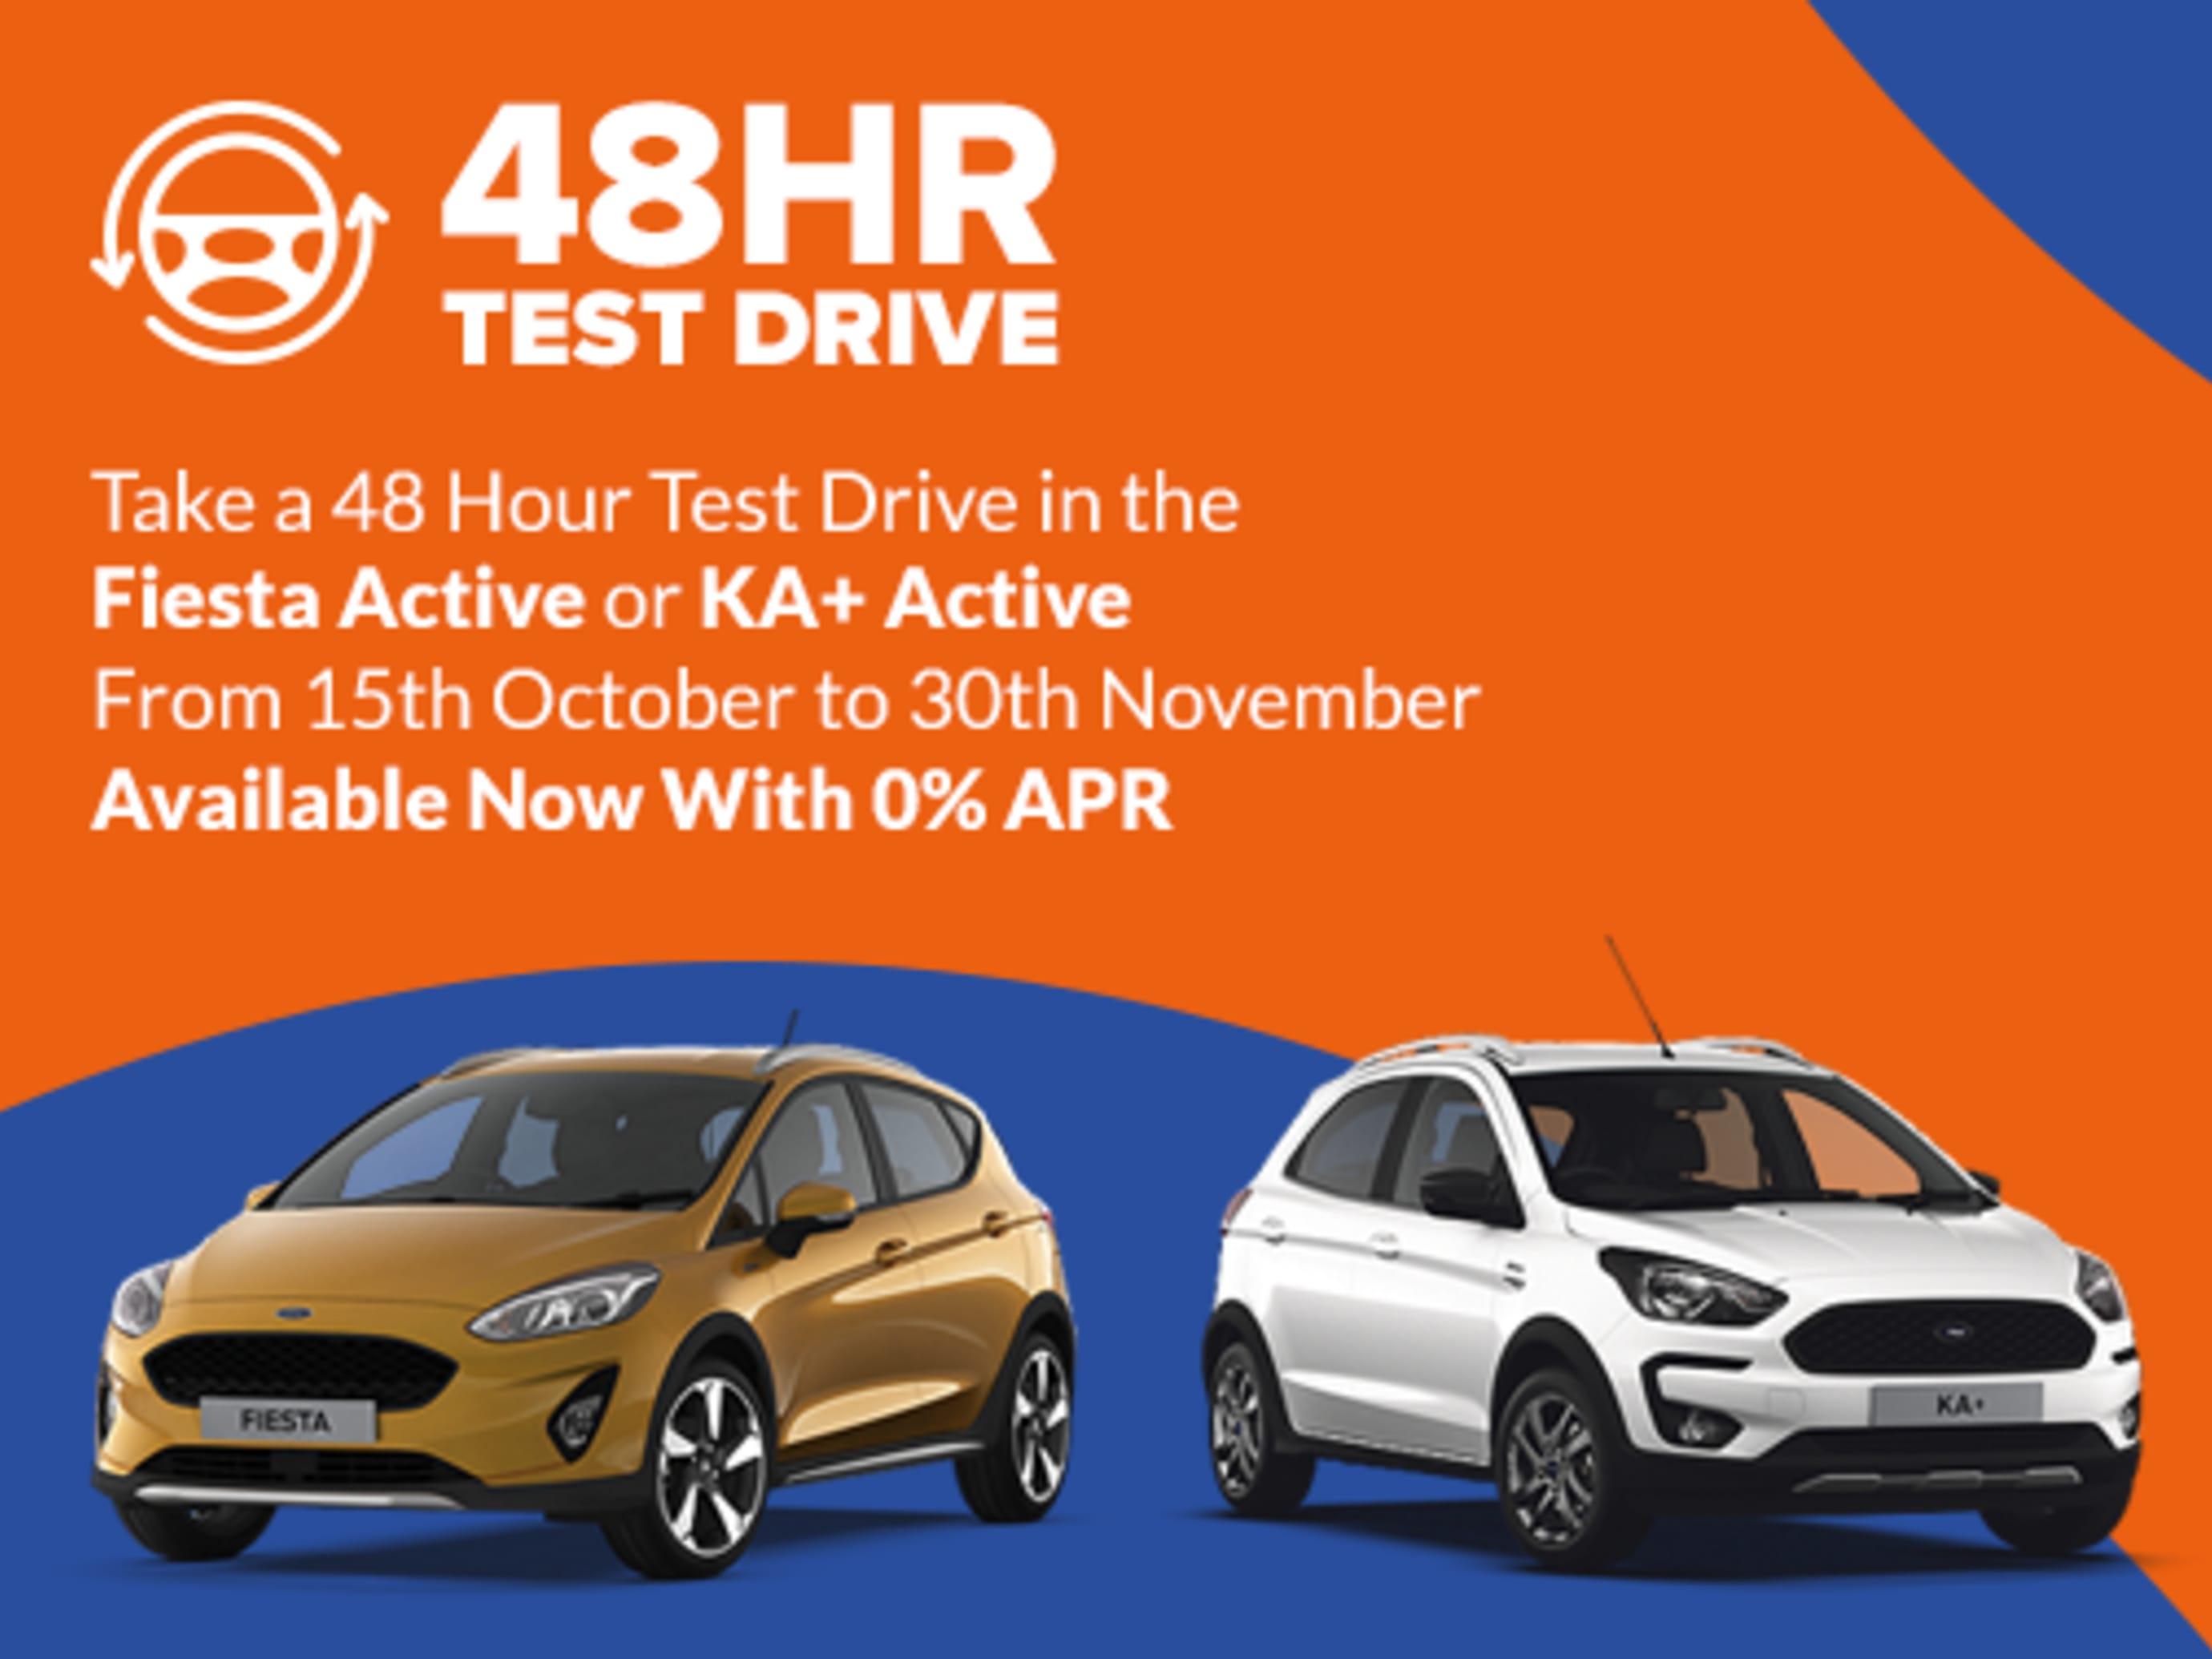 48 hour test drive